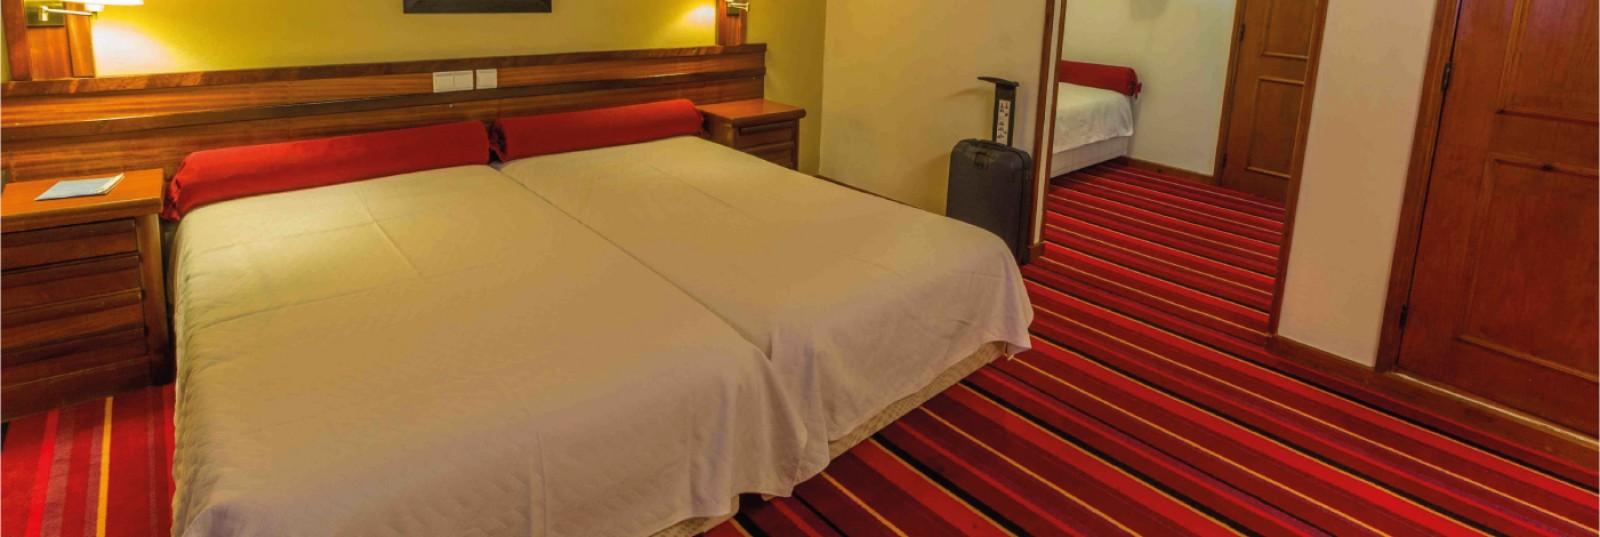 Hotel Eurosol Seia Camelo - triple